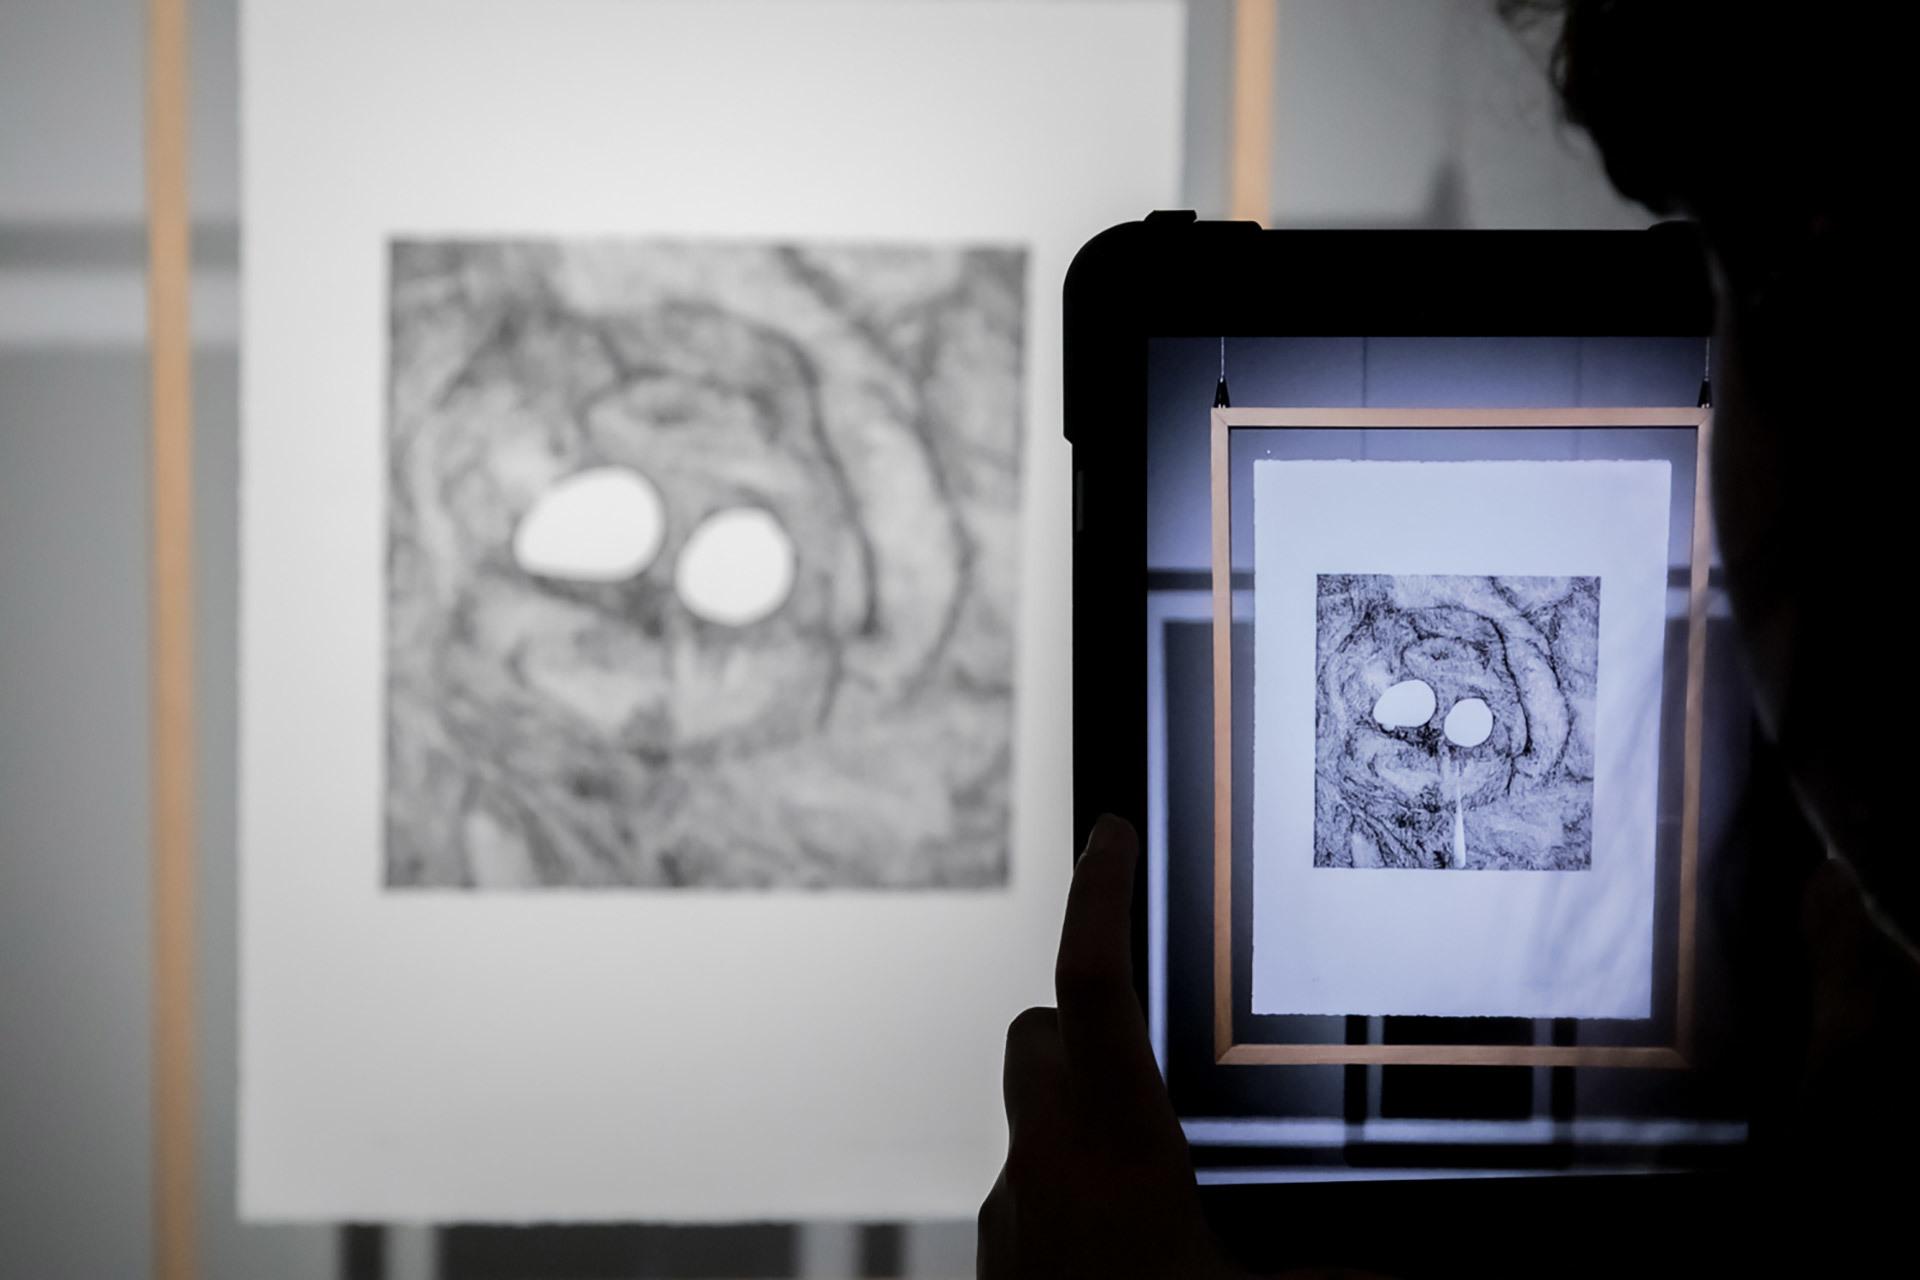 Mirages Et Miracles exposition Adrien M Claire B PHISTUDIO Sandra Larochelle